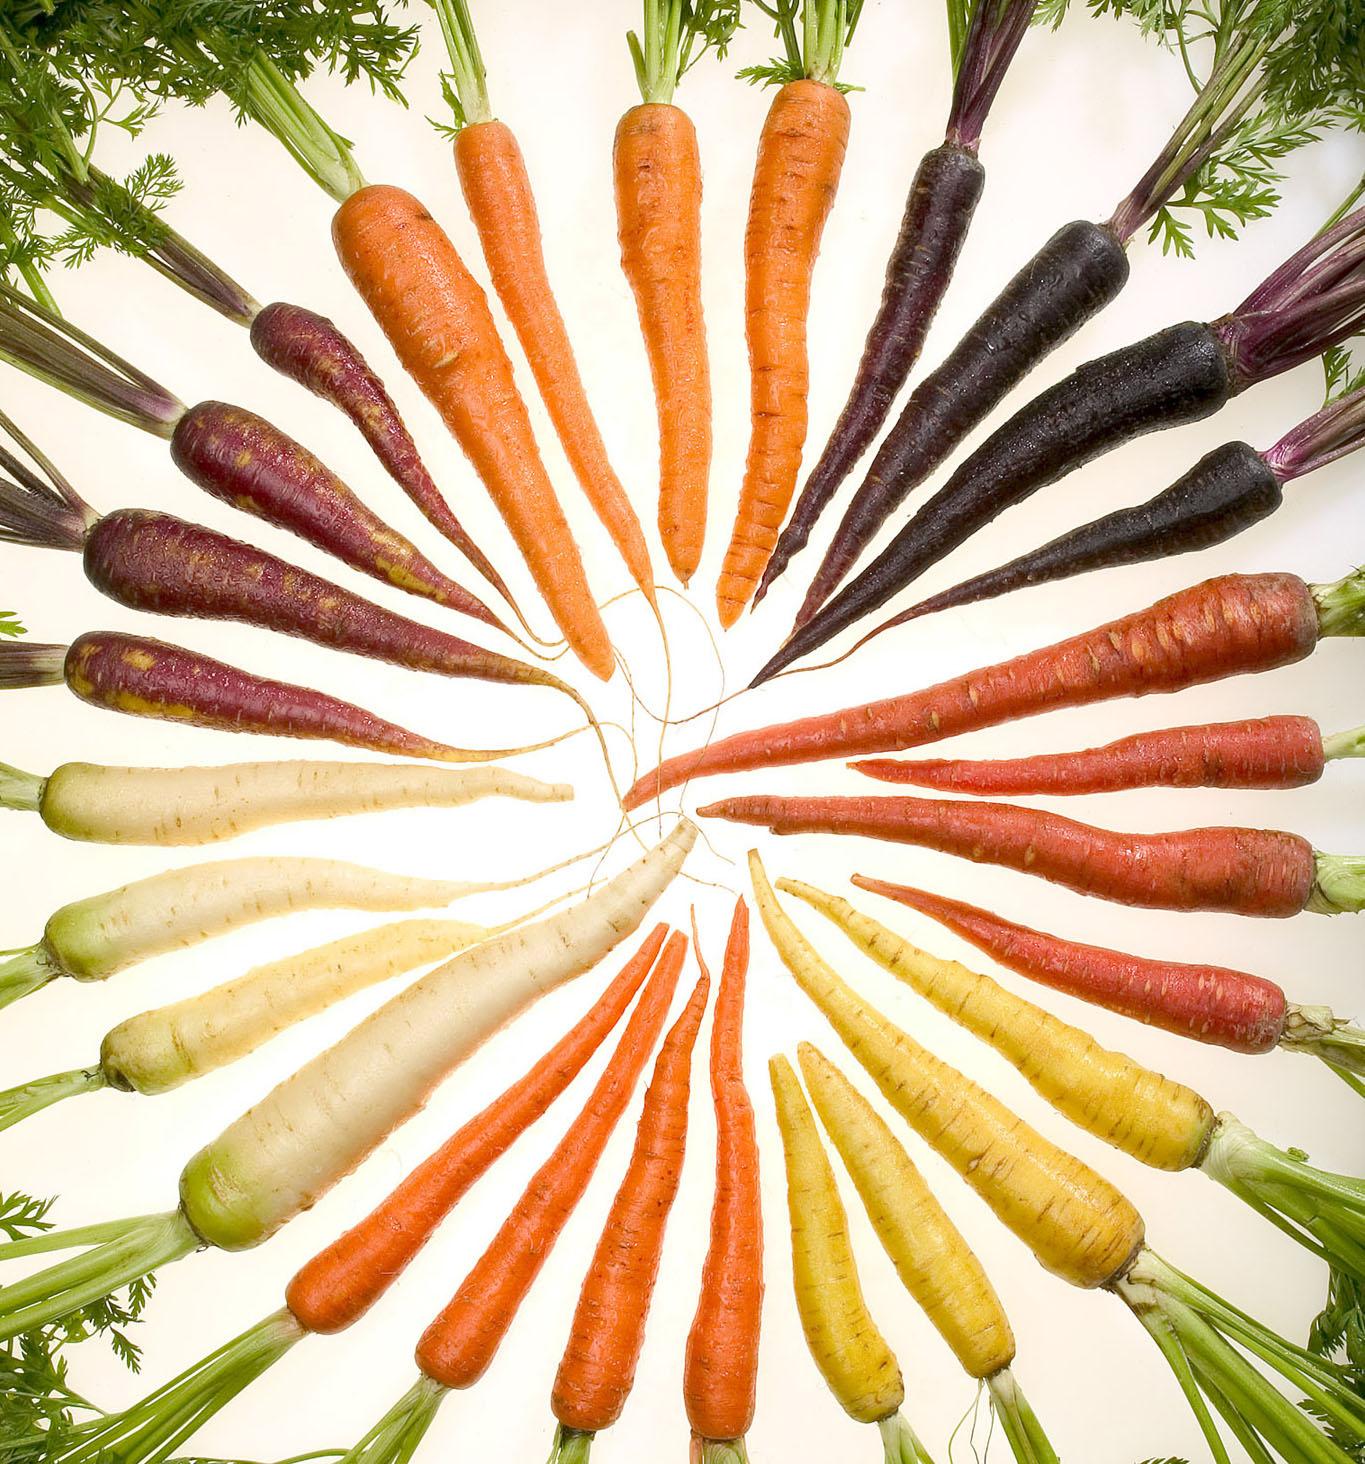 Carrots - Carrot-Museum-co-uk